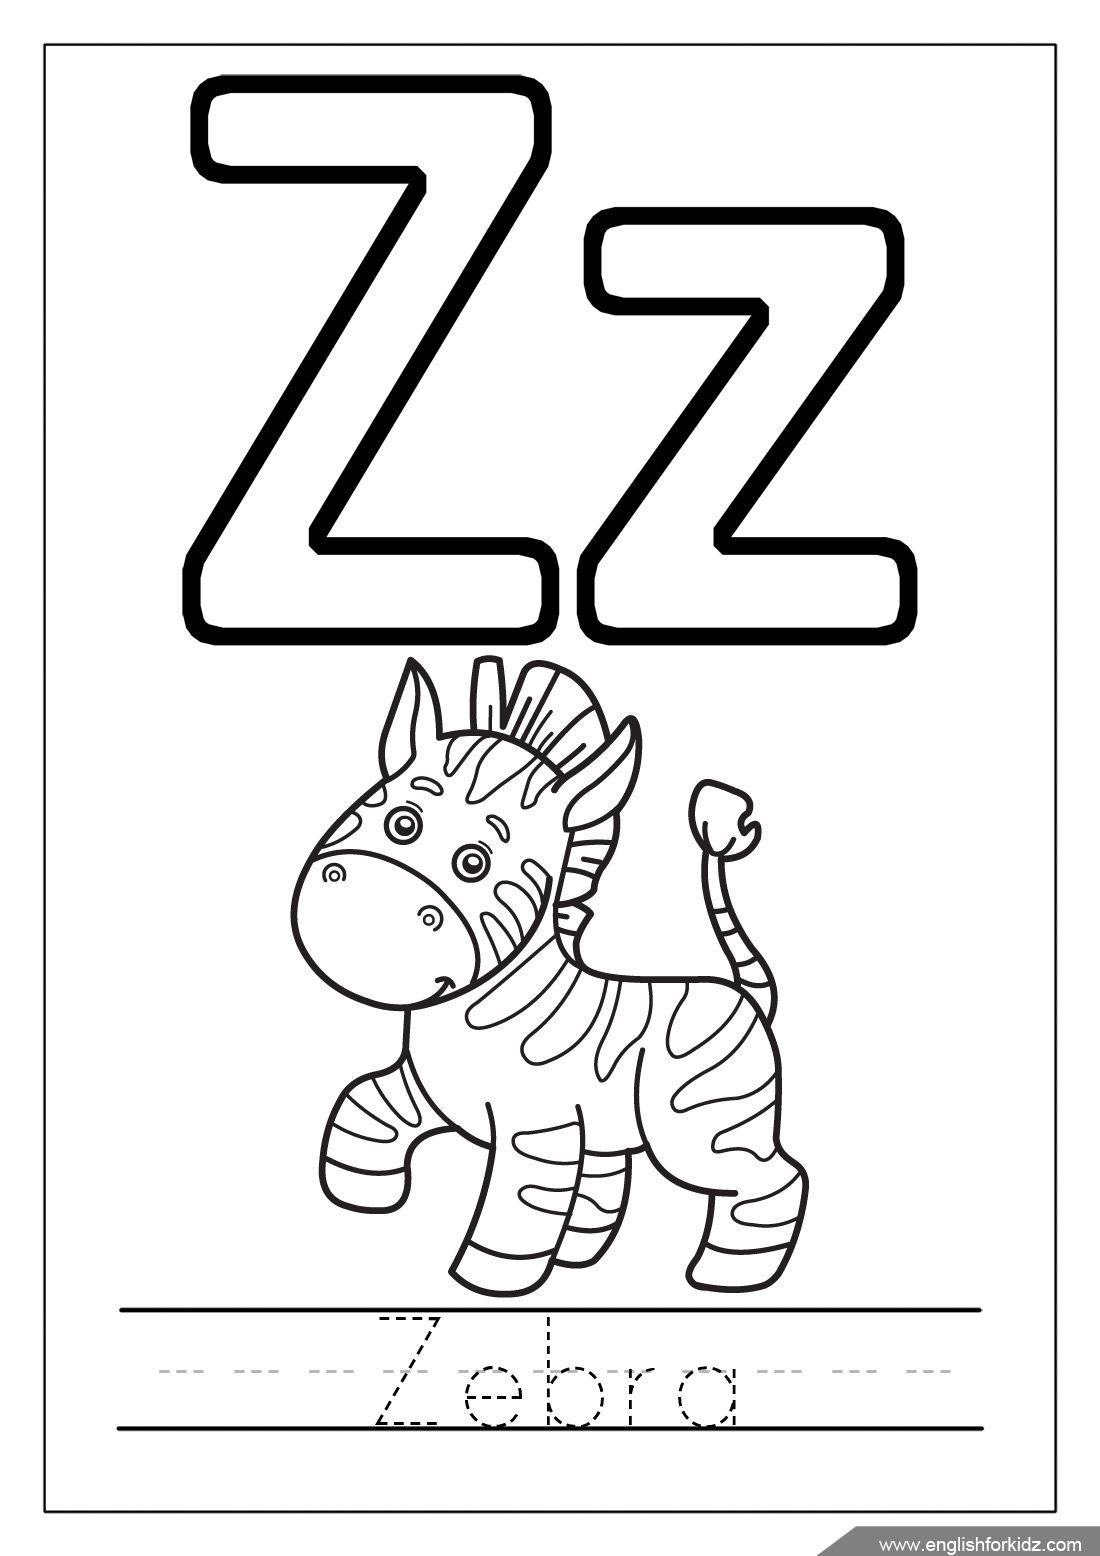 Alphabet coloring page, letter Z coloring, zebra coloring